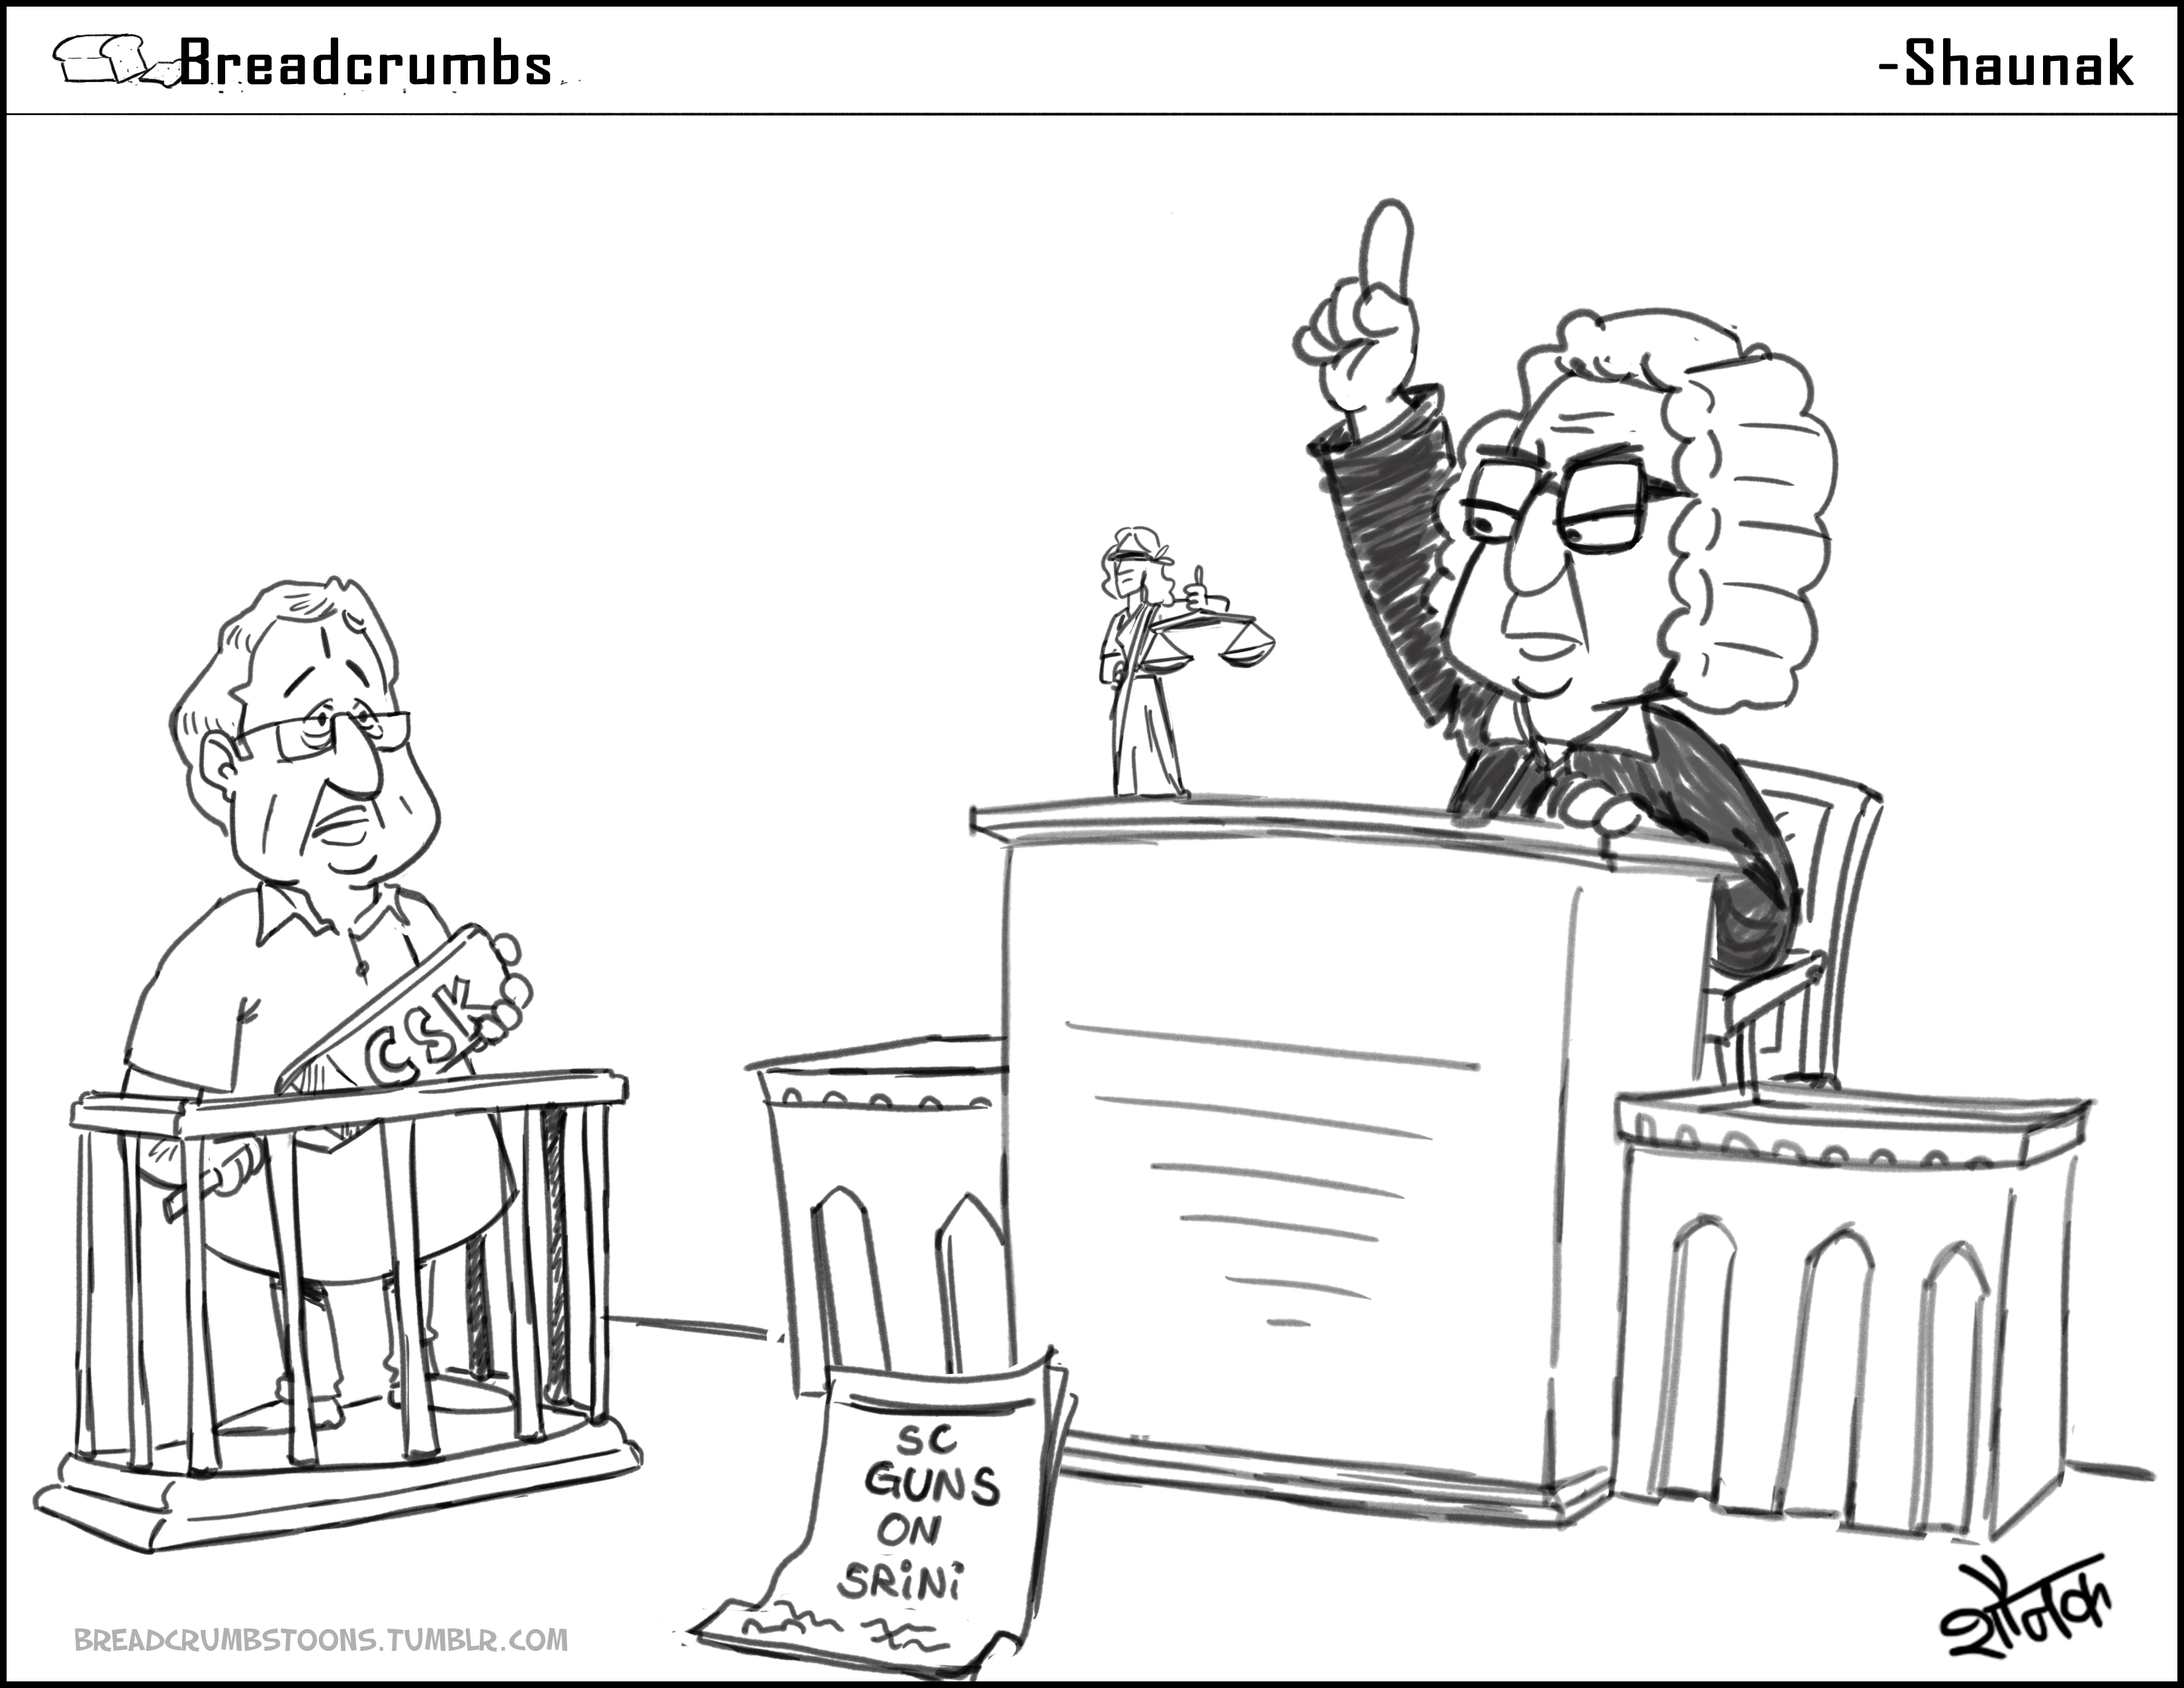 Comic: Supreme Court intervenes and refuses to give